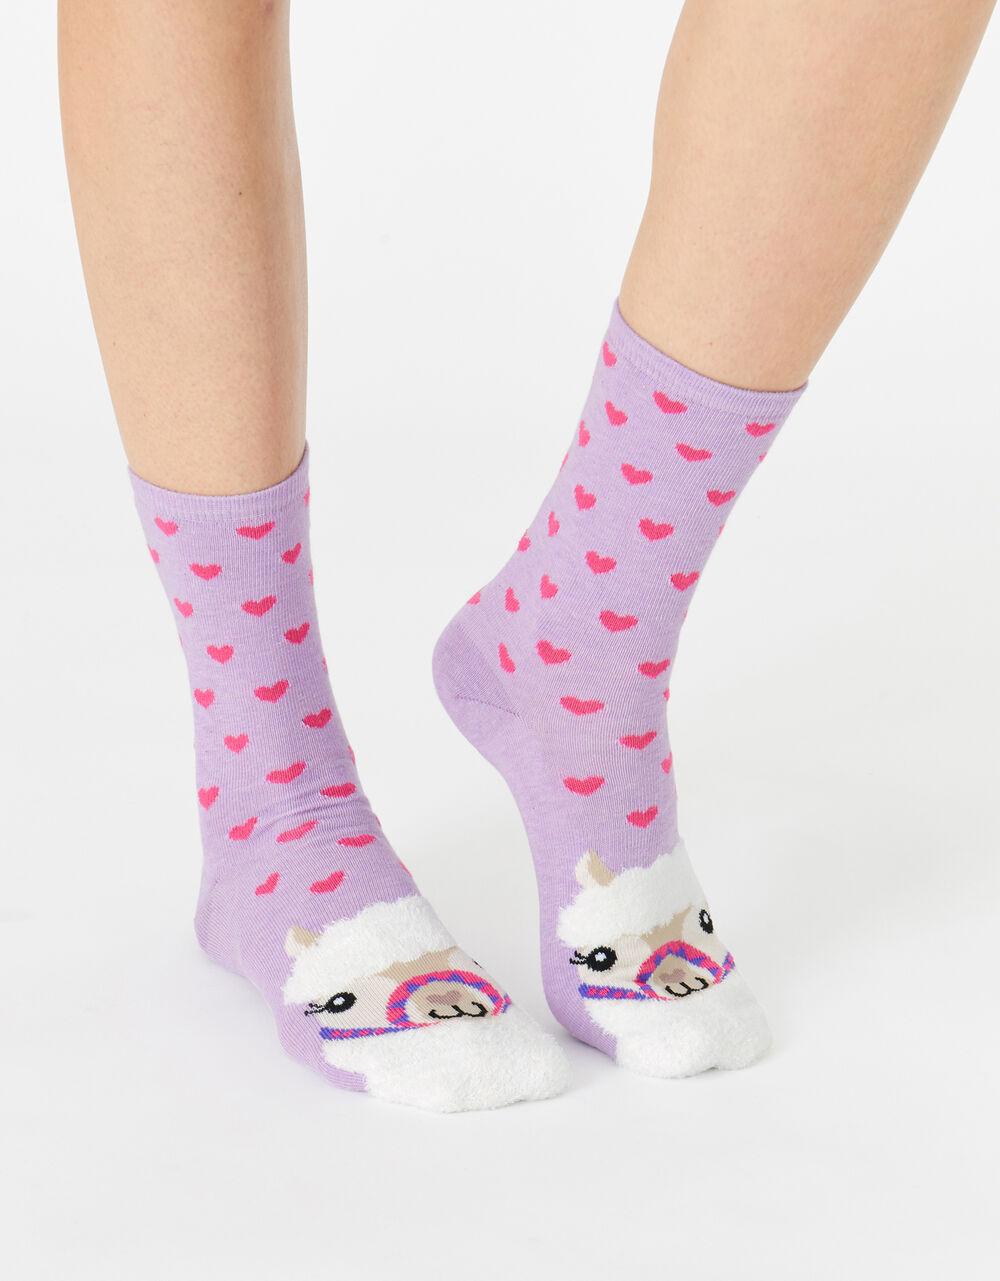 Lulu Llama Fluffy Face Socks , , large